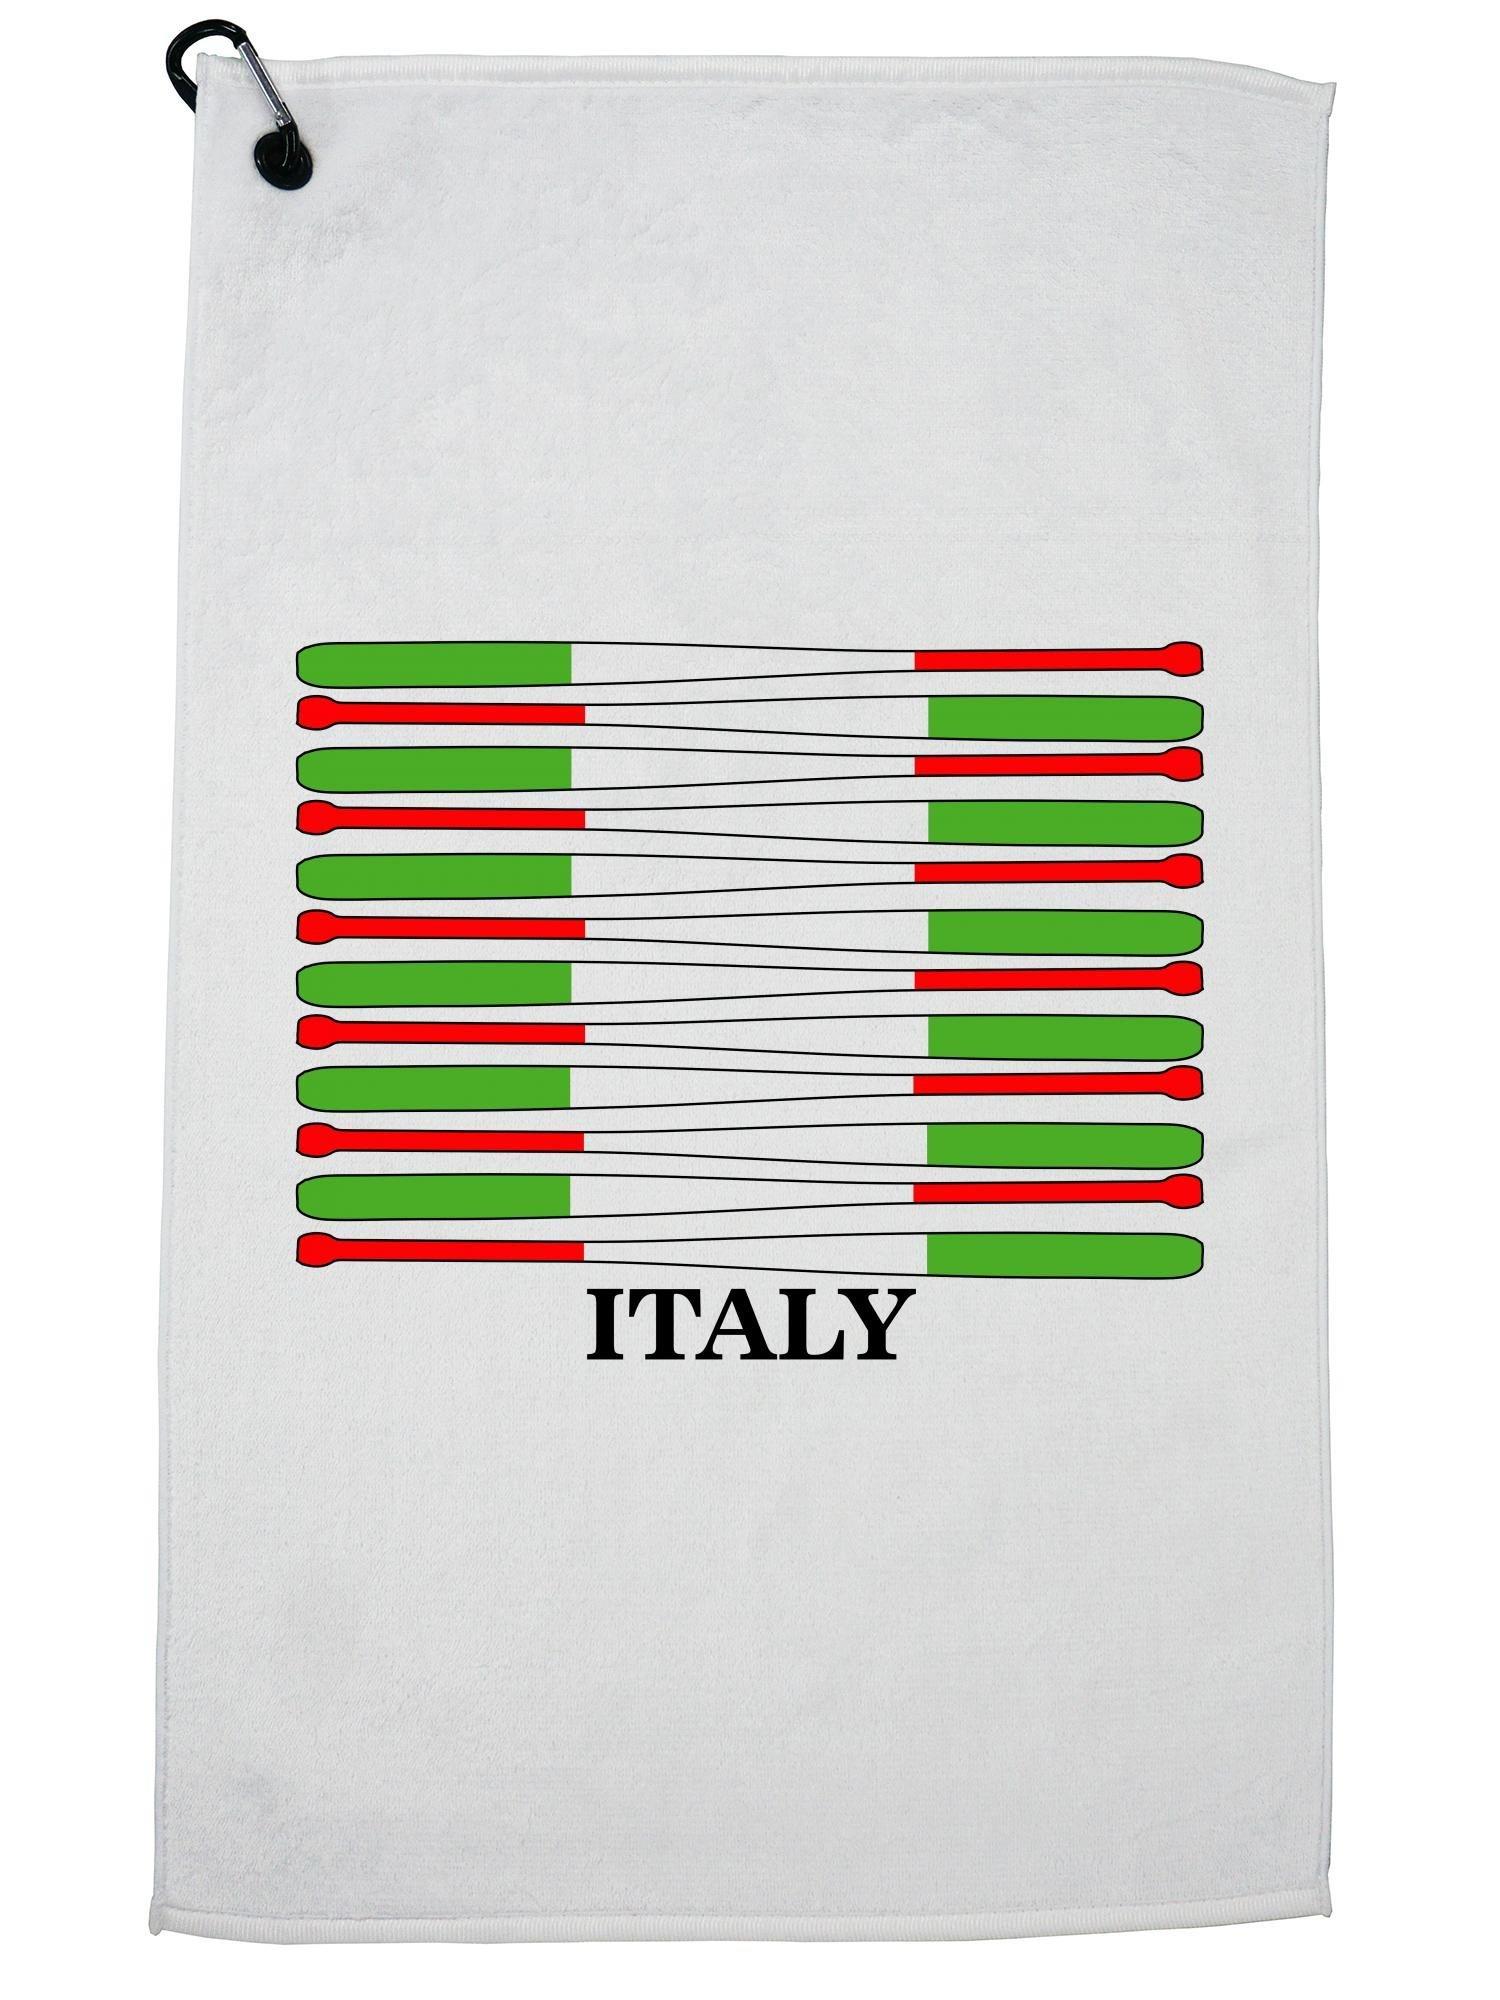 Hollywood Thread Italy Baseball Classic - World Vintage Bats Flag Golf Towel with Carabiner Clip